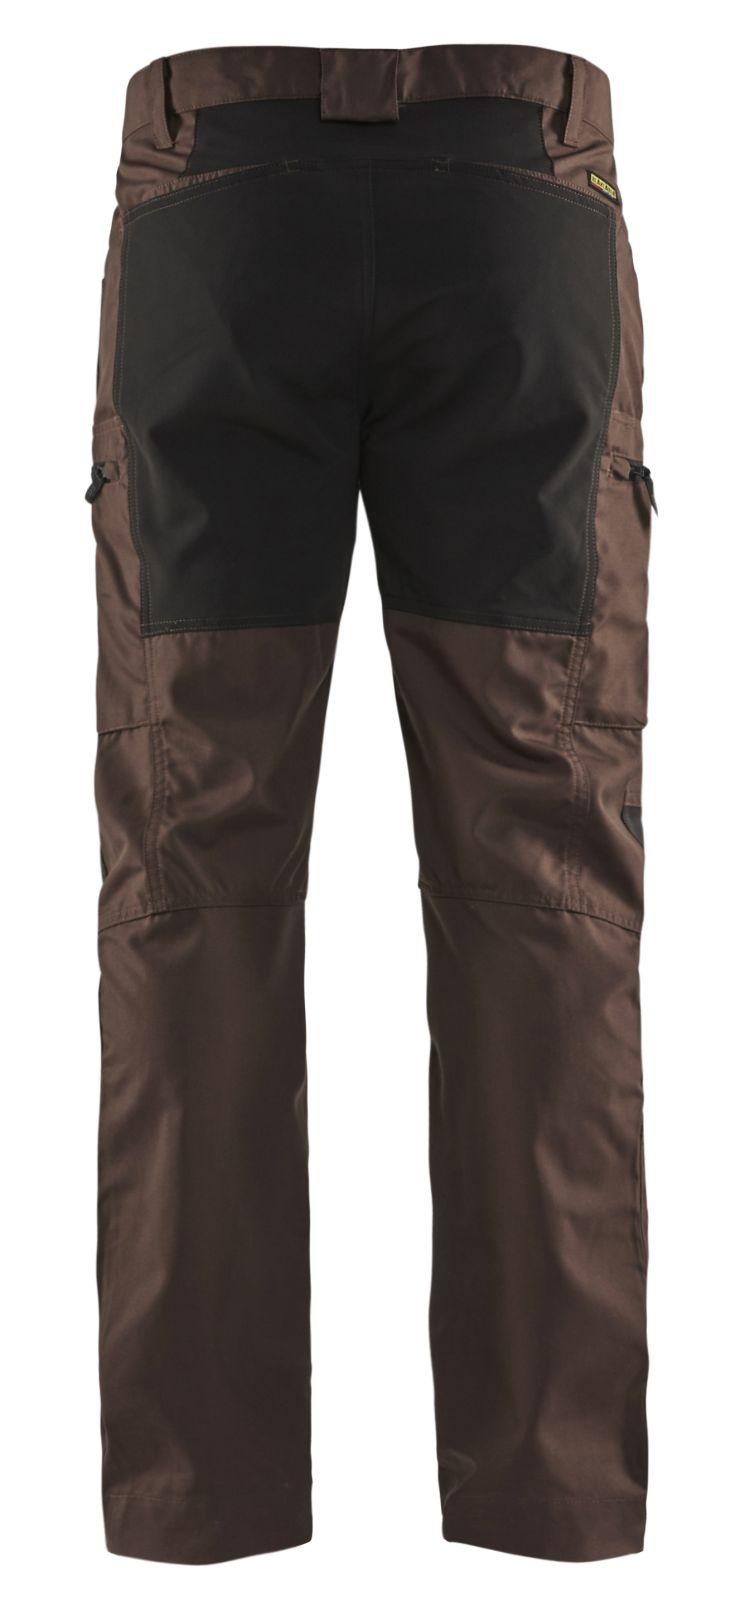 Blaklader Werkbroeken 14591845 met Stretch bruin-zwart(7899)